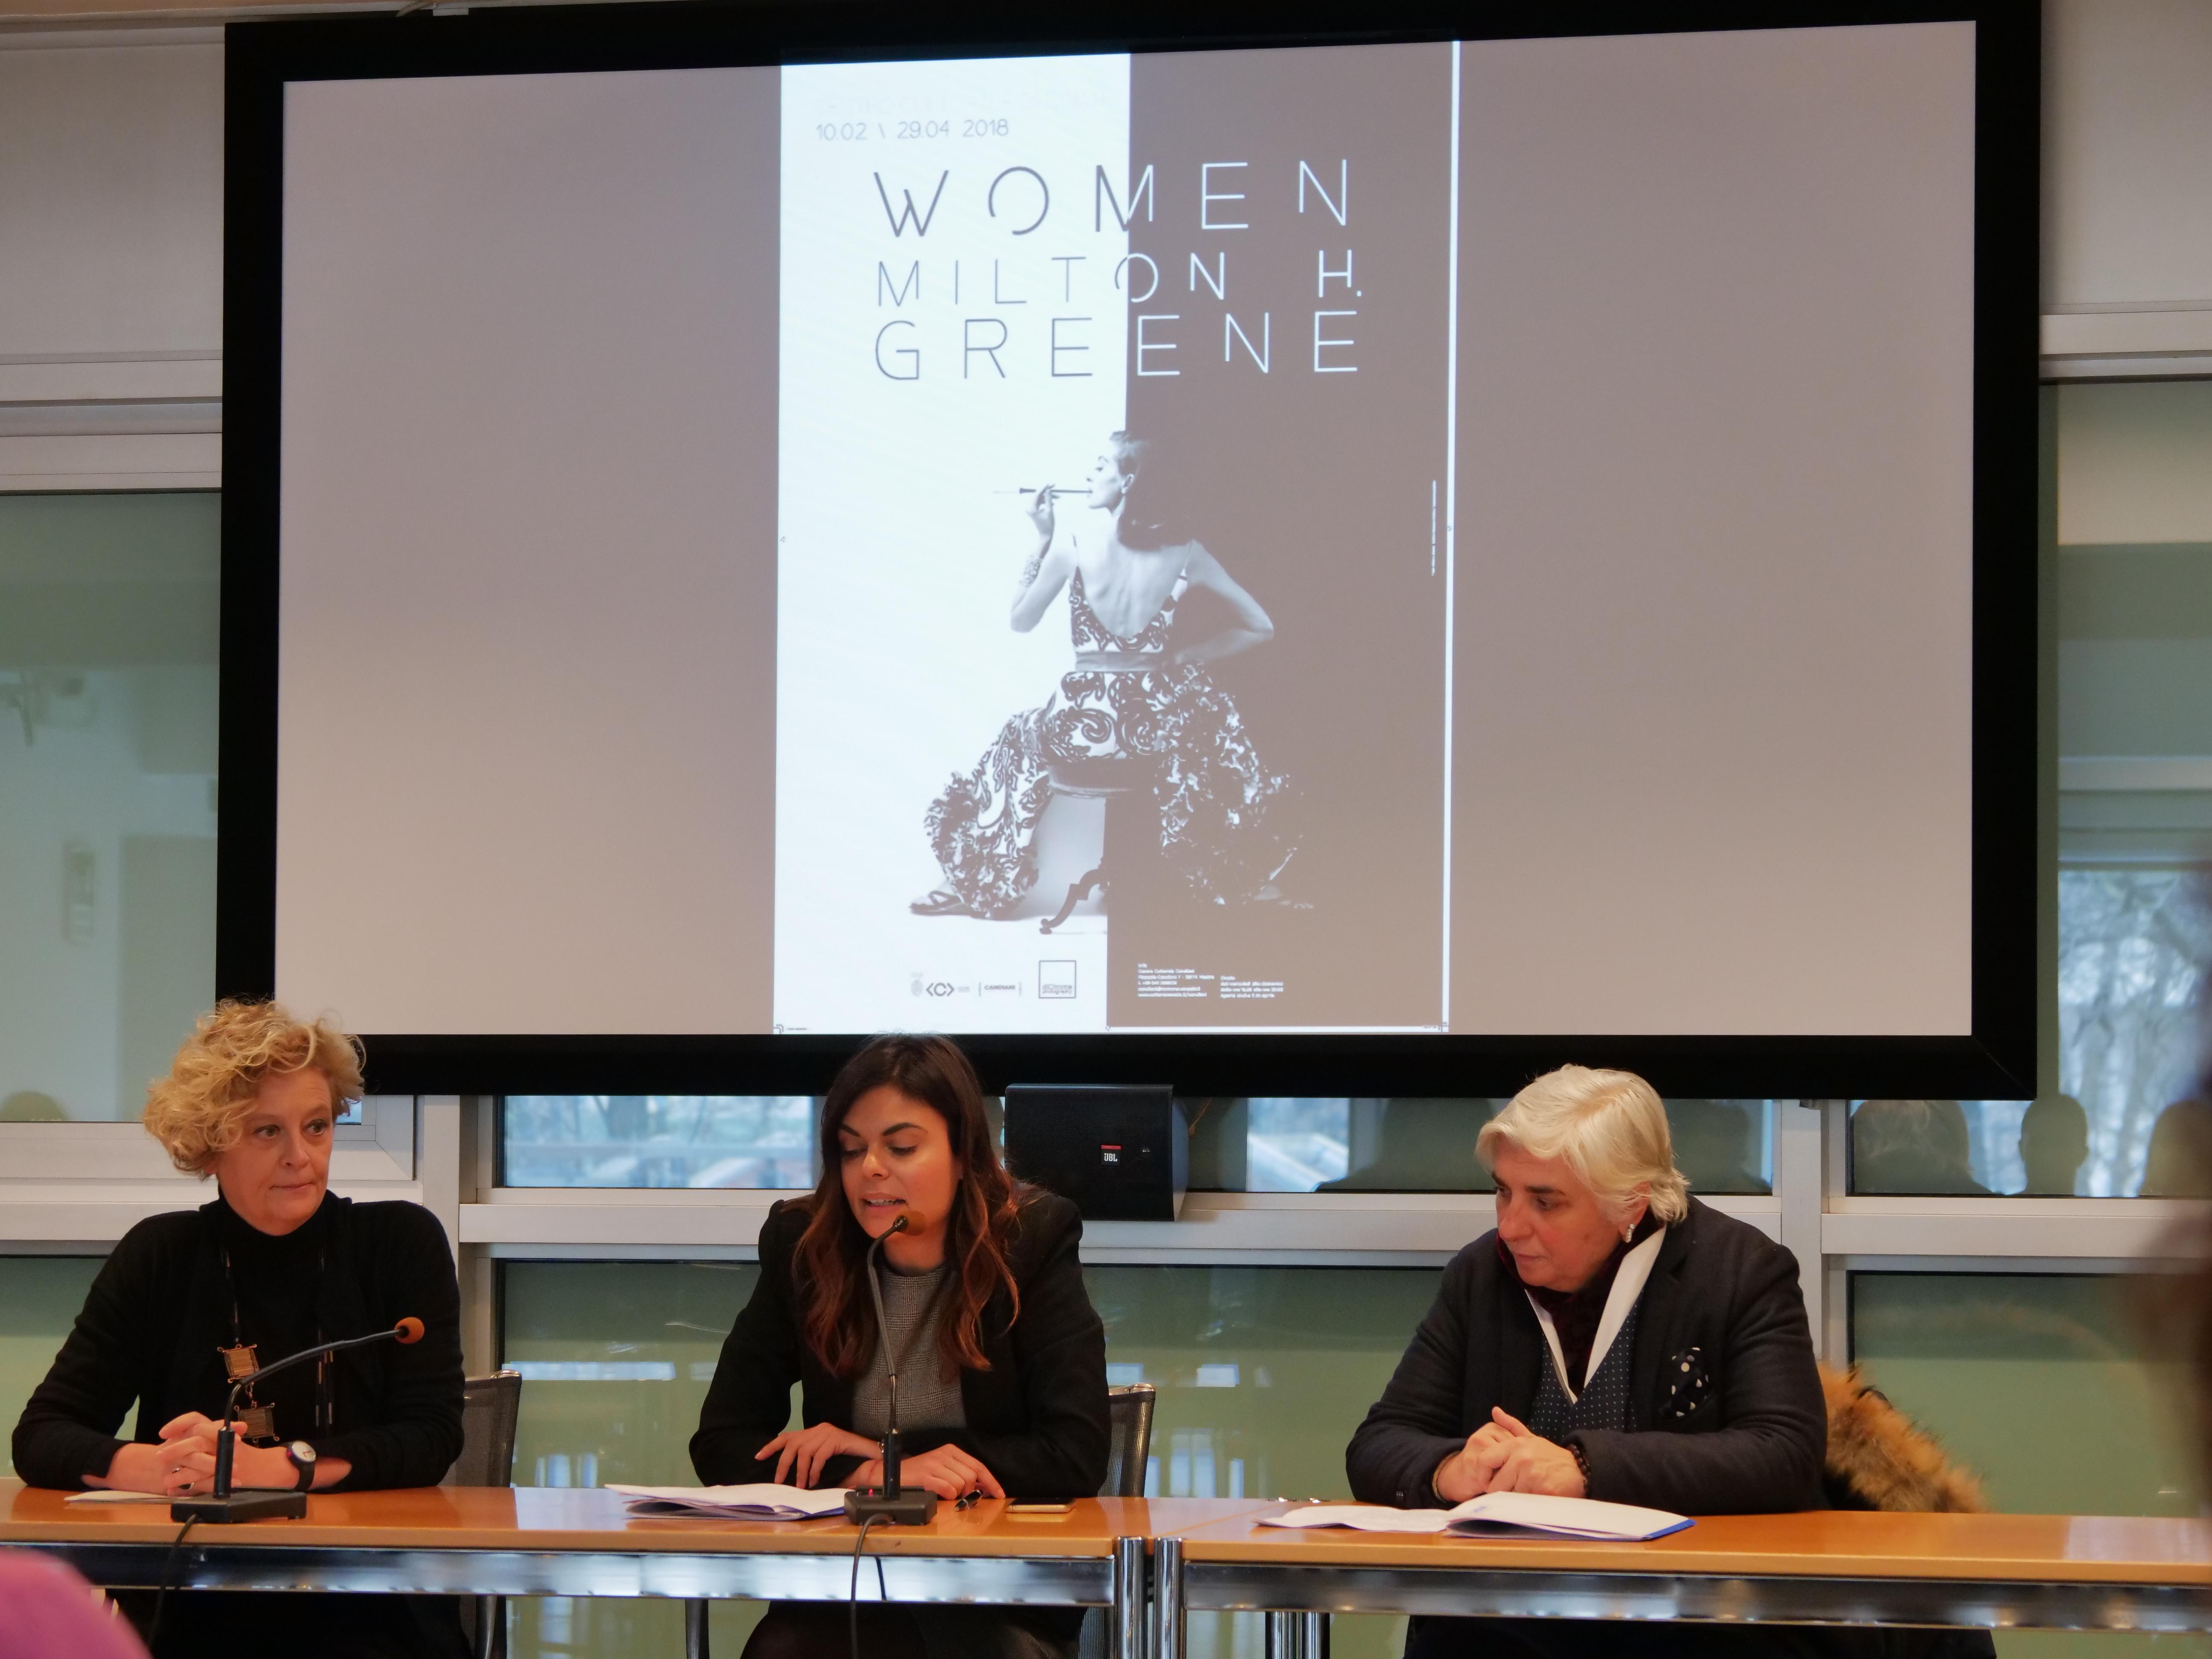 conferenza stampa mostra Women